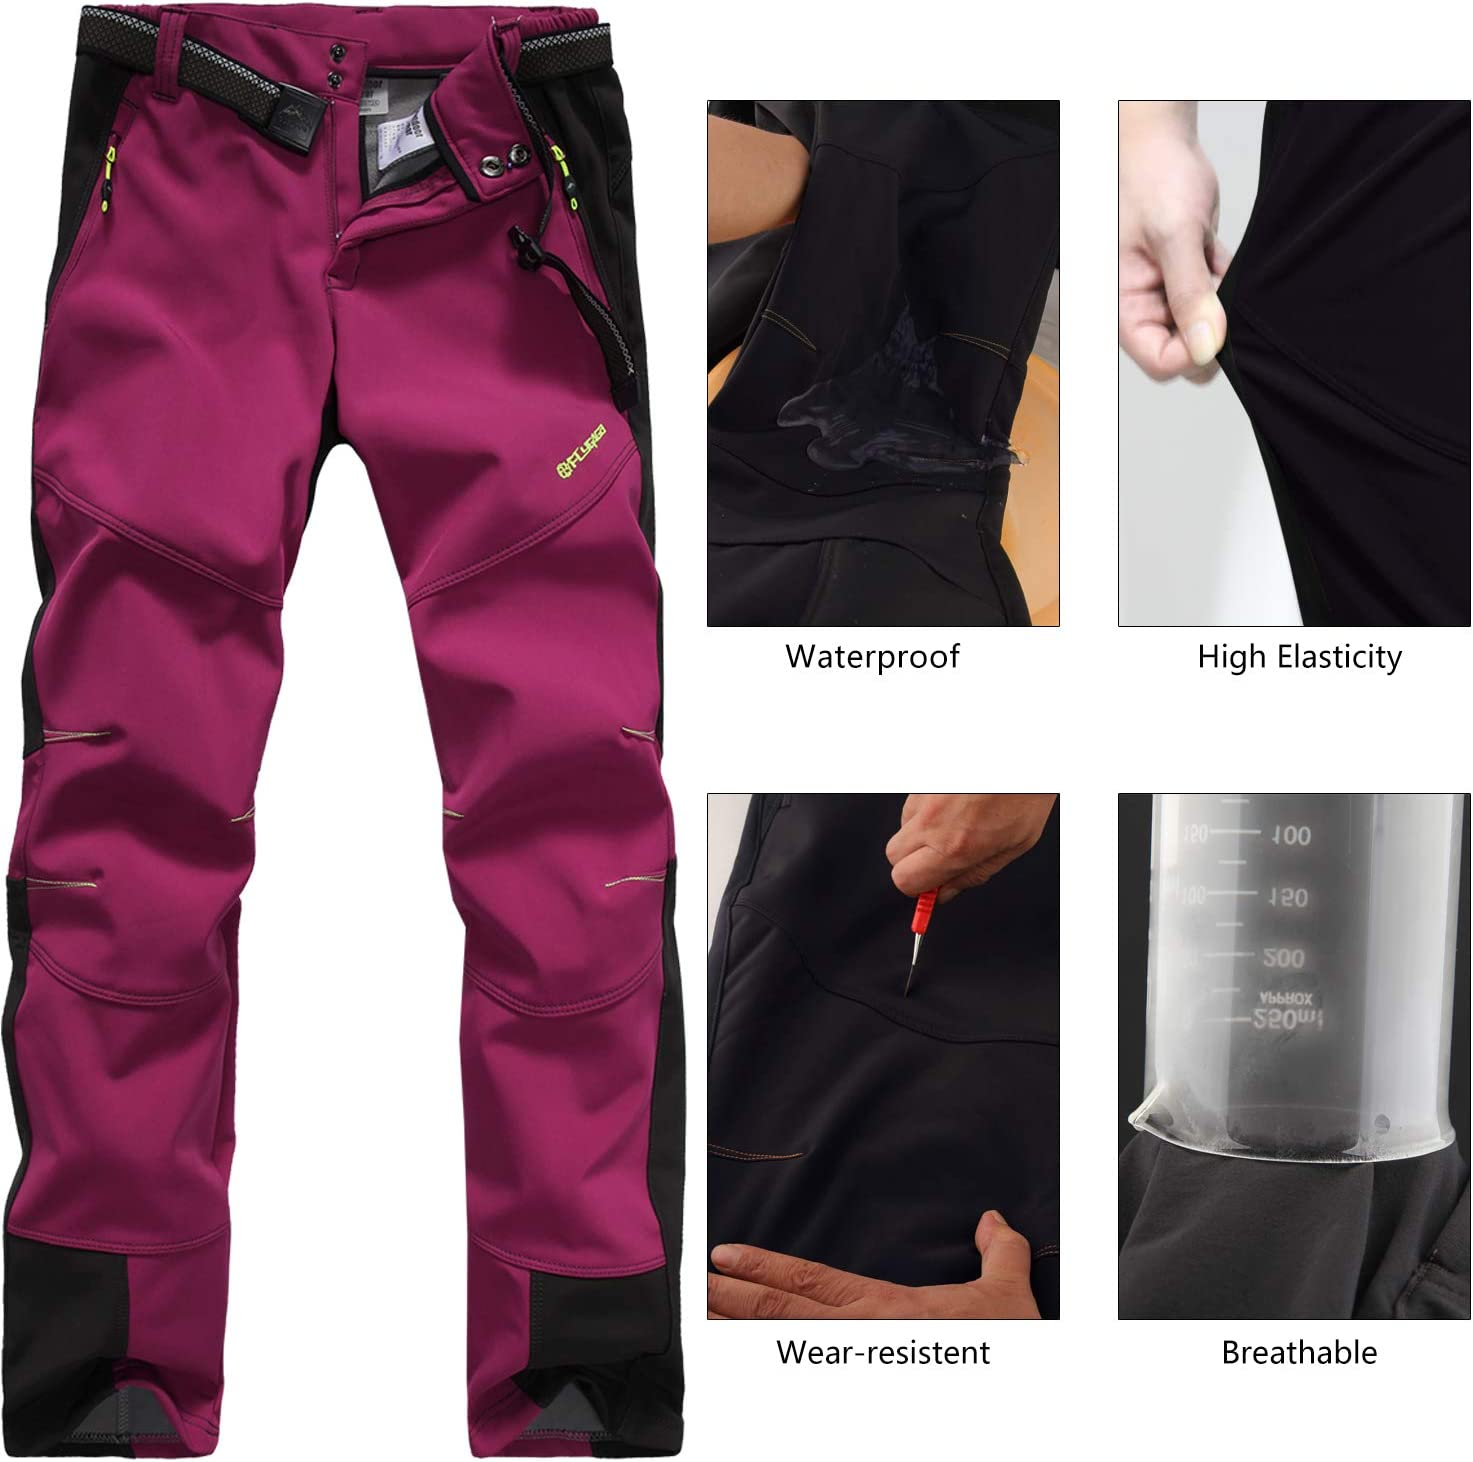 FLYGAGA Womens Ski Trousers Weatherproof Softshell Trousers Thermal Fleece Lined Trousers Hiking Trekking Outdoor Pants